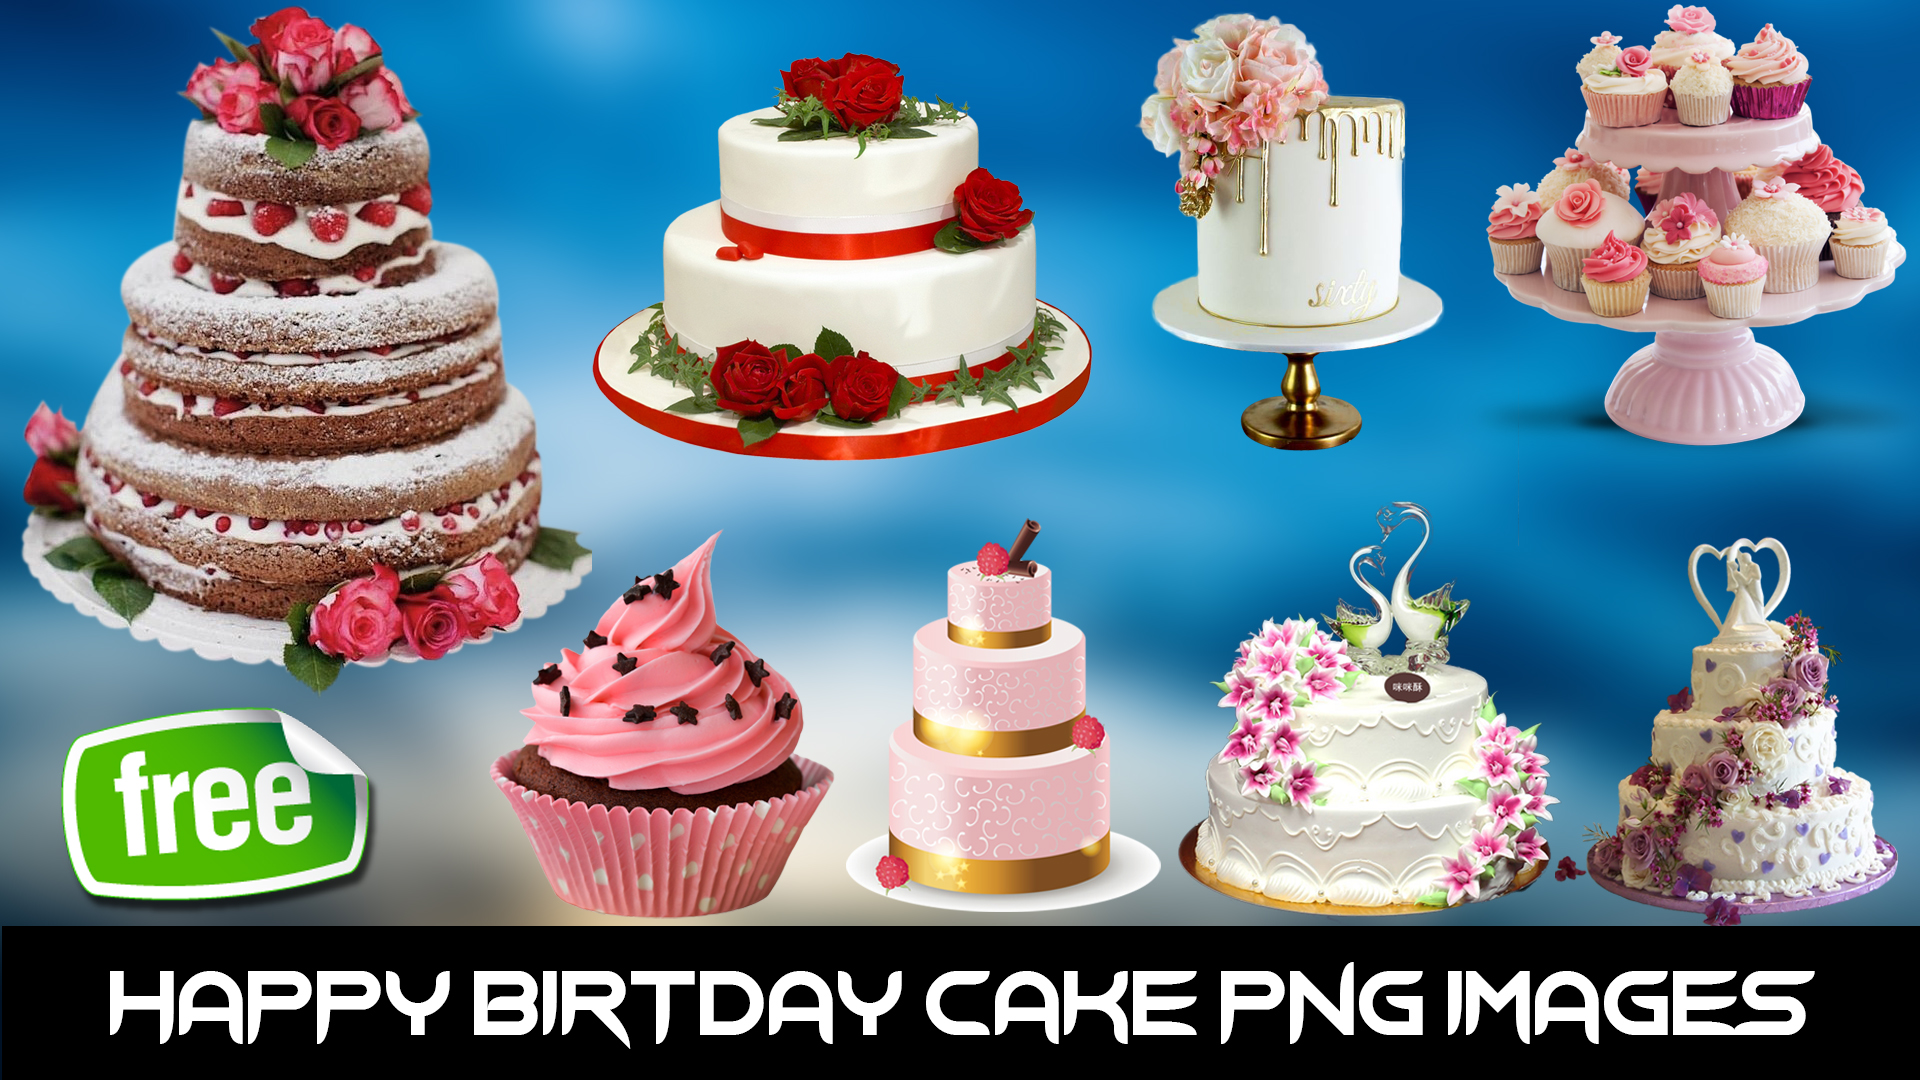 1st Birthday Cake Png